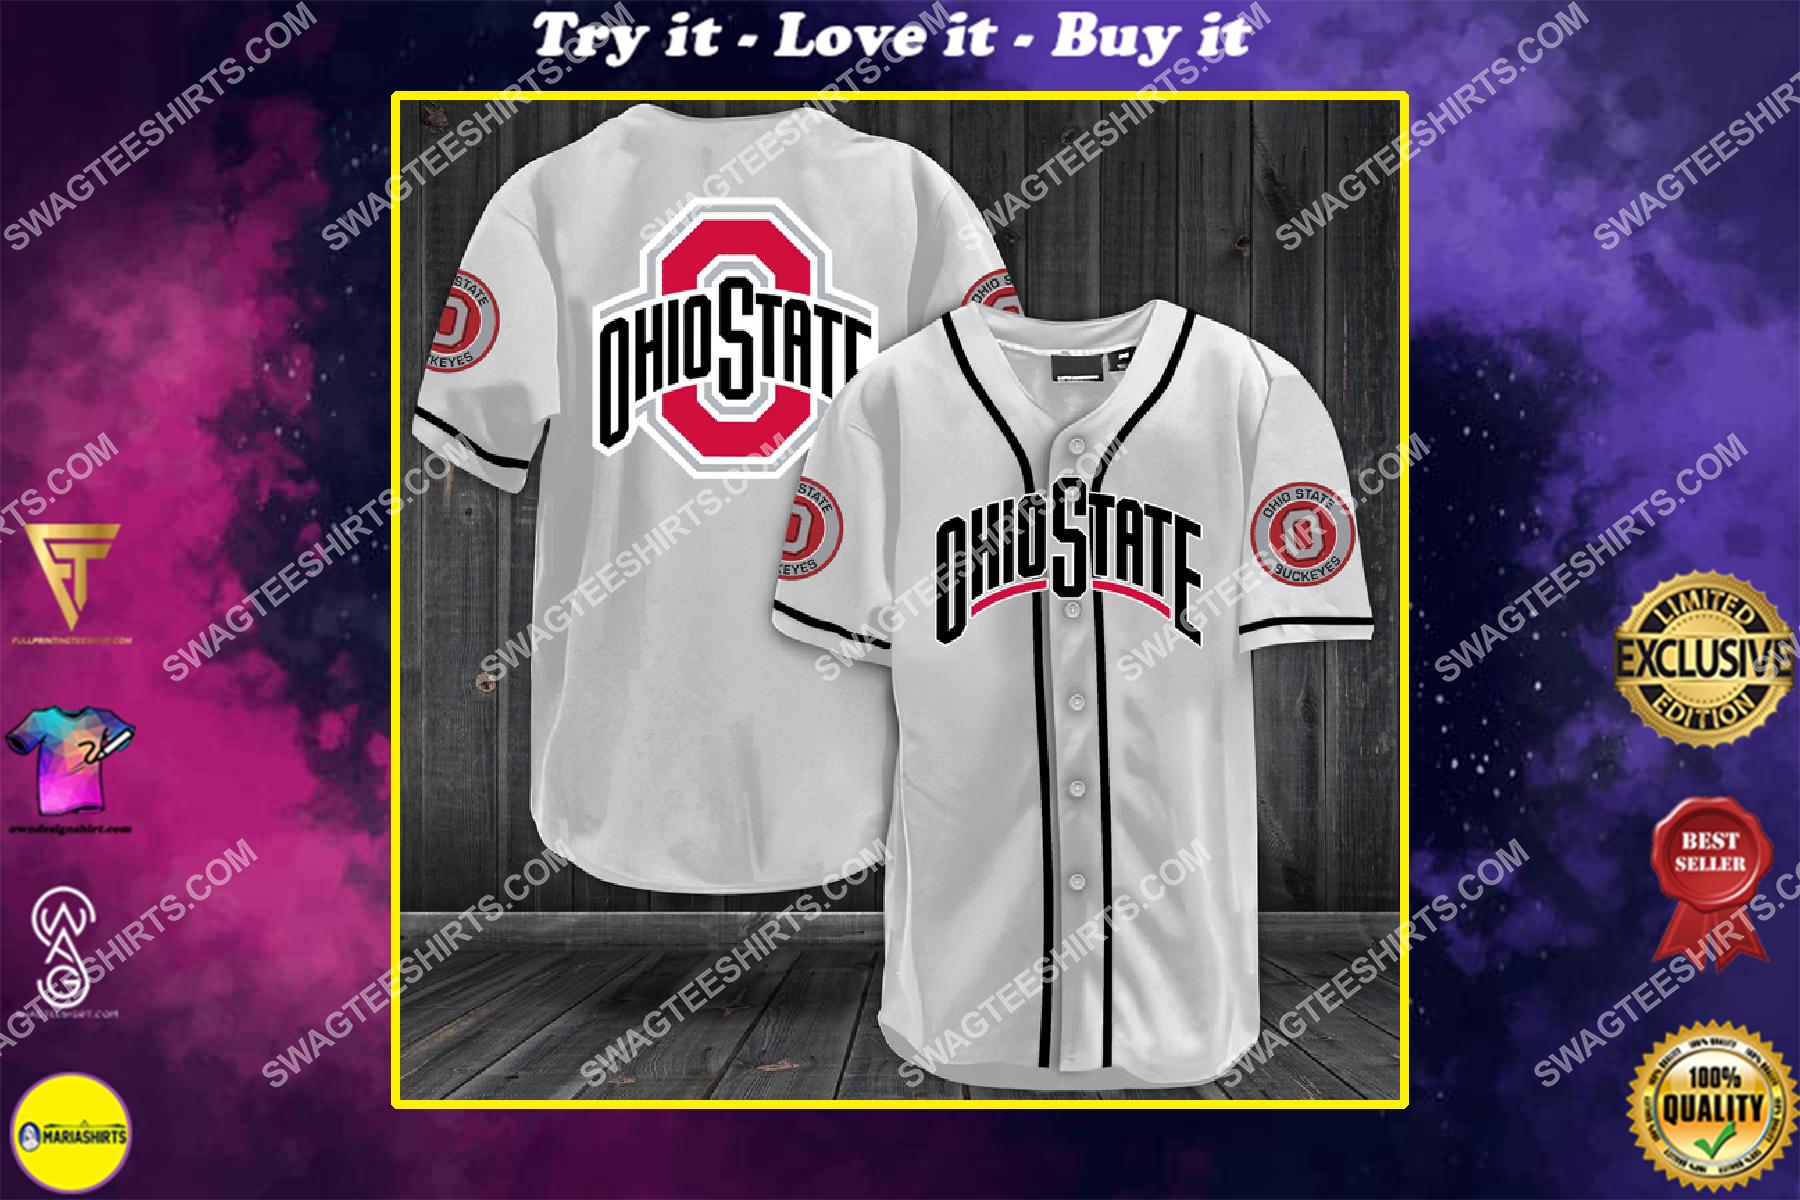 the ohio state buckeyes football full printing baseball jersey